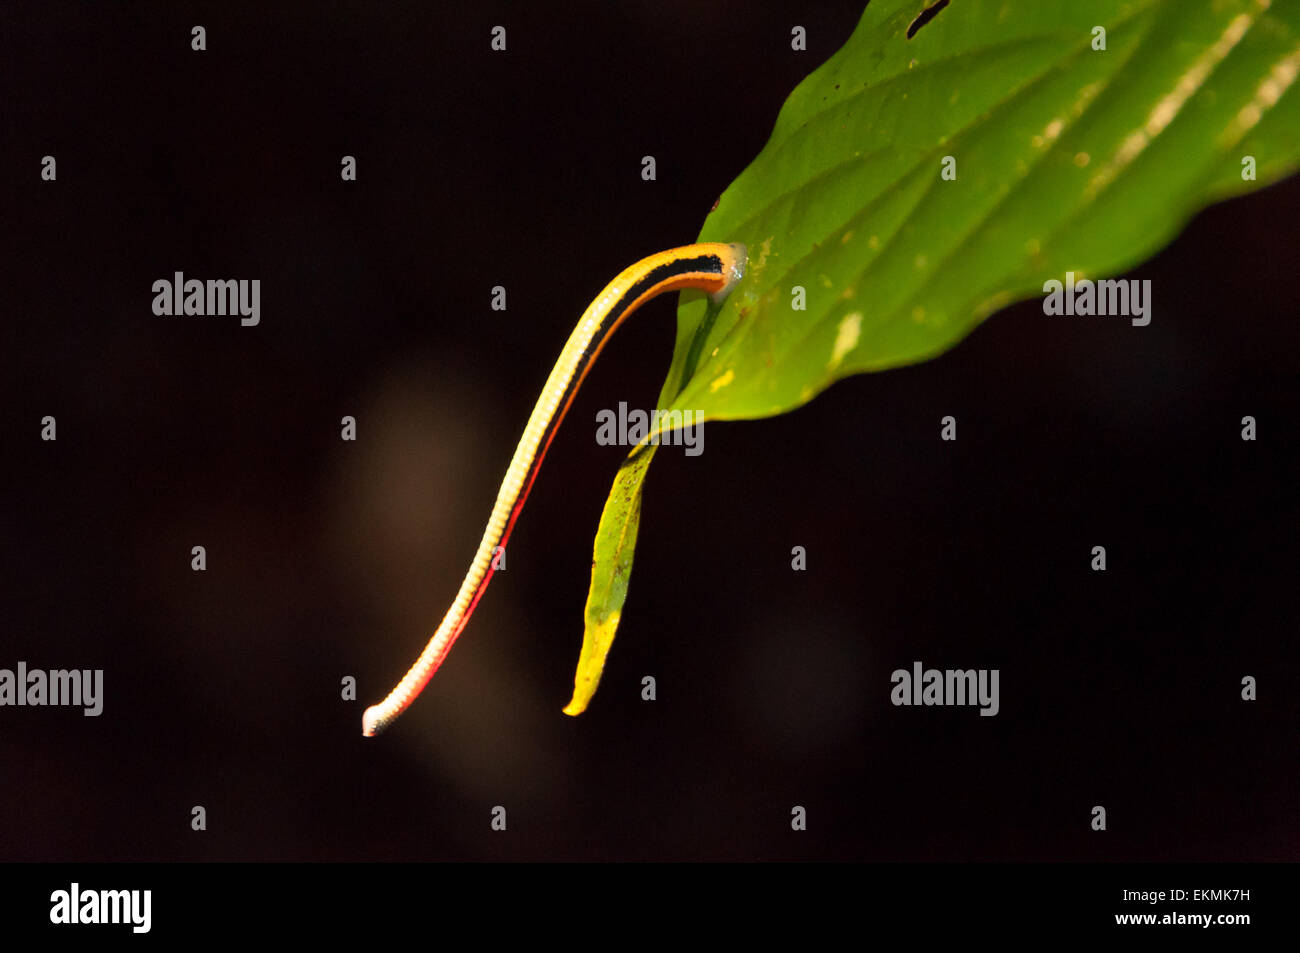 tiger-leech-attached-to-a-leaf-in-rainforest-jungle-borneo-malaysia-EKMK7H.jpg